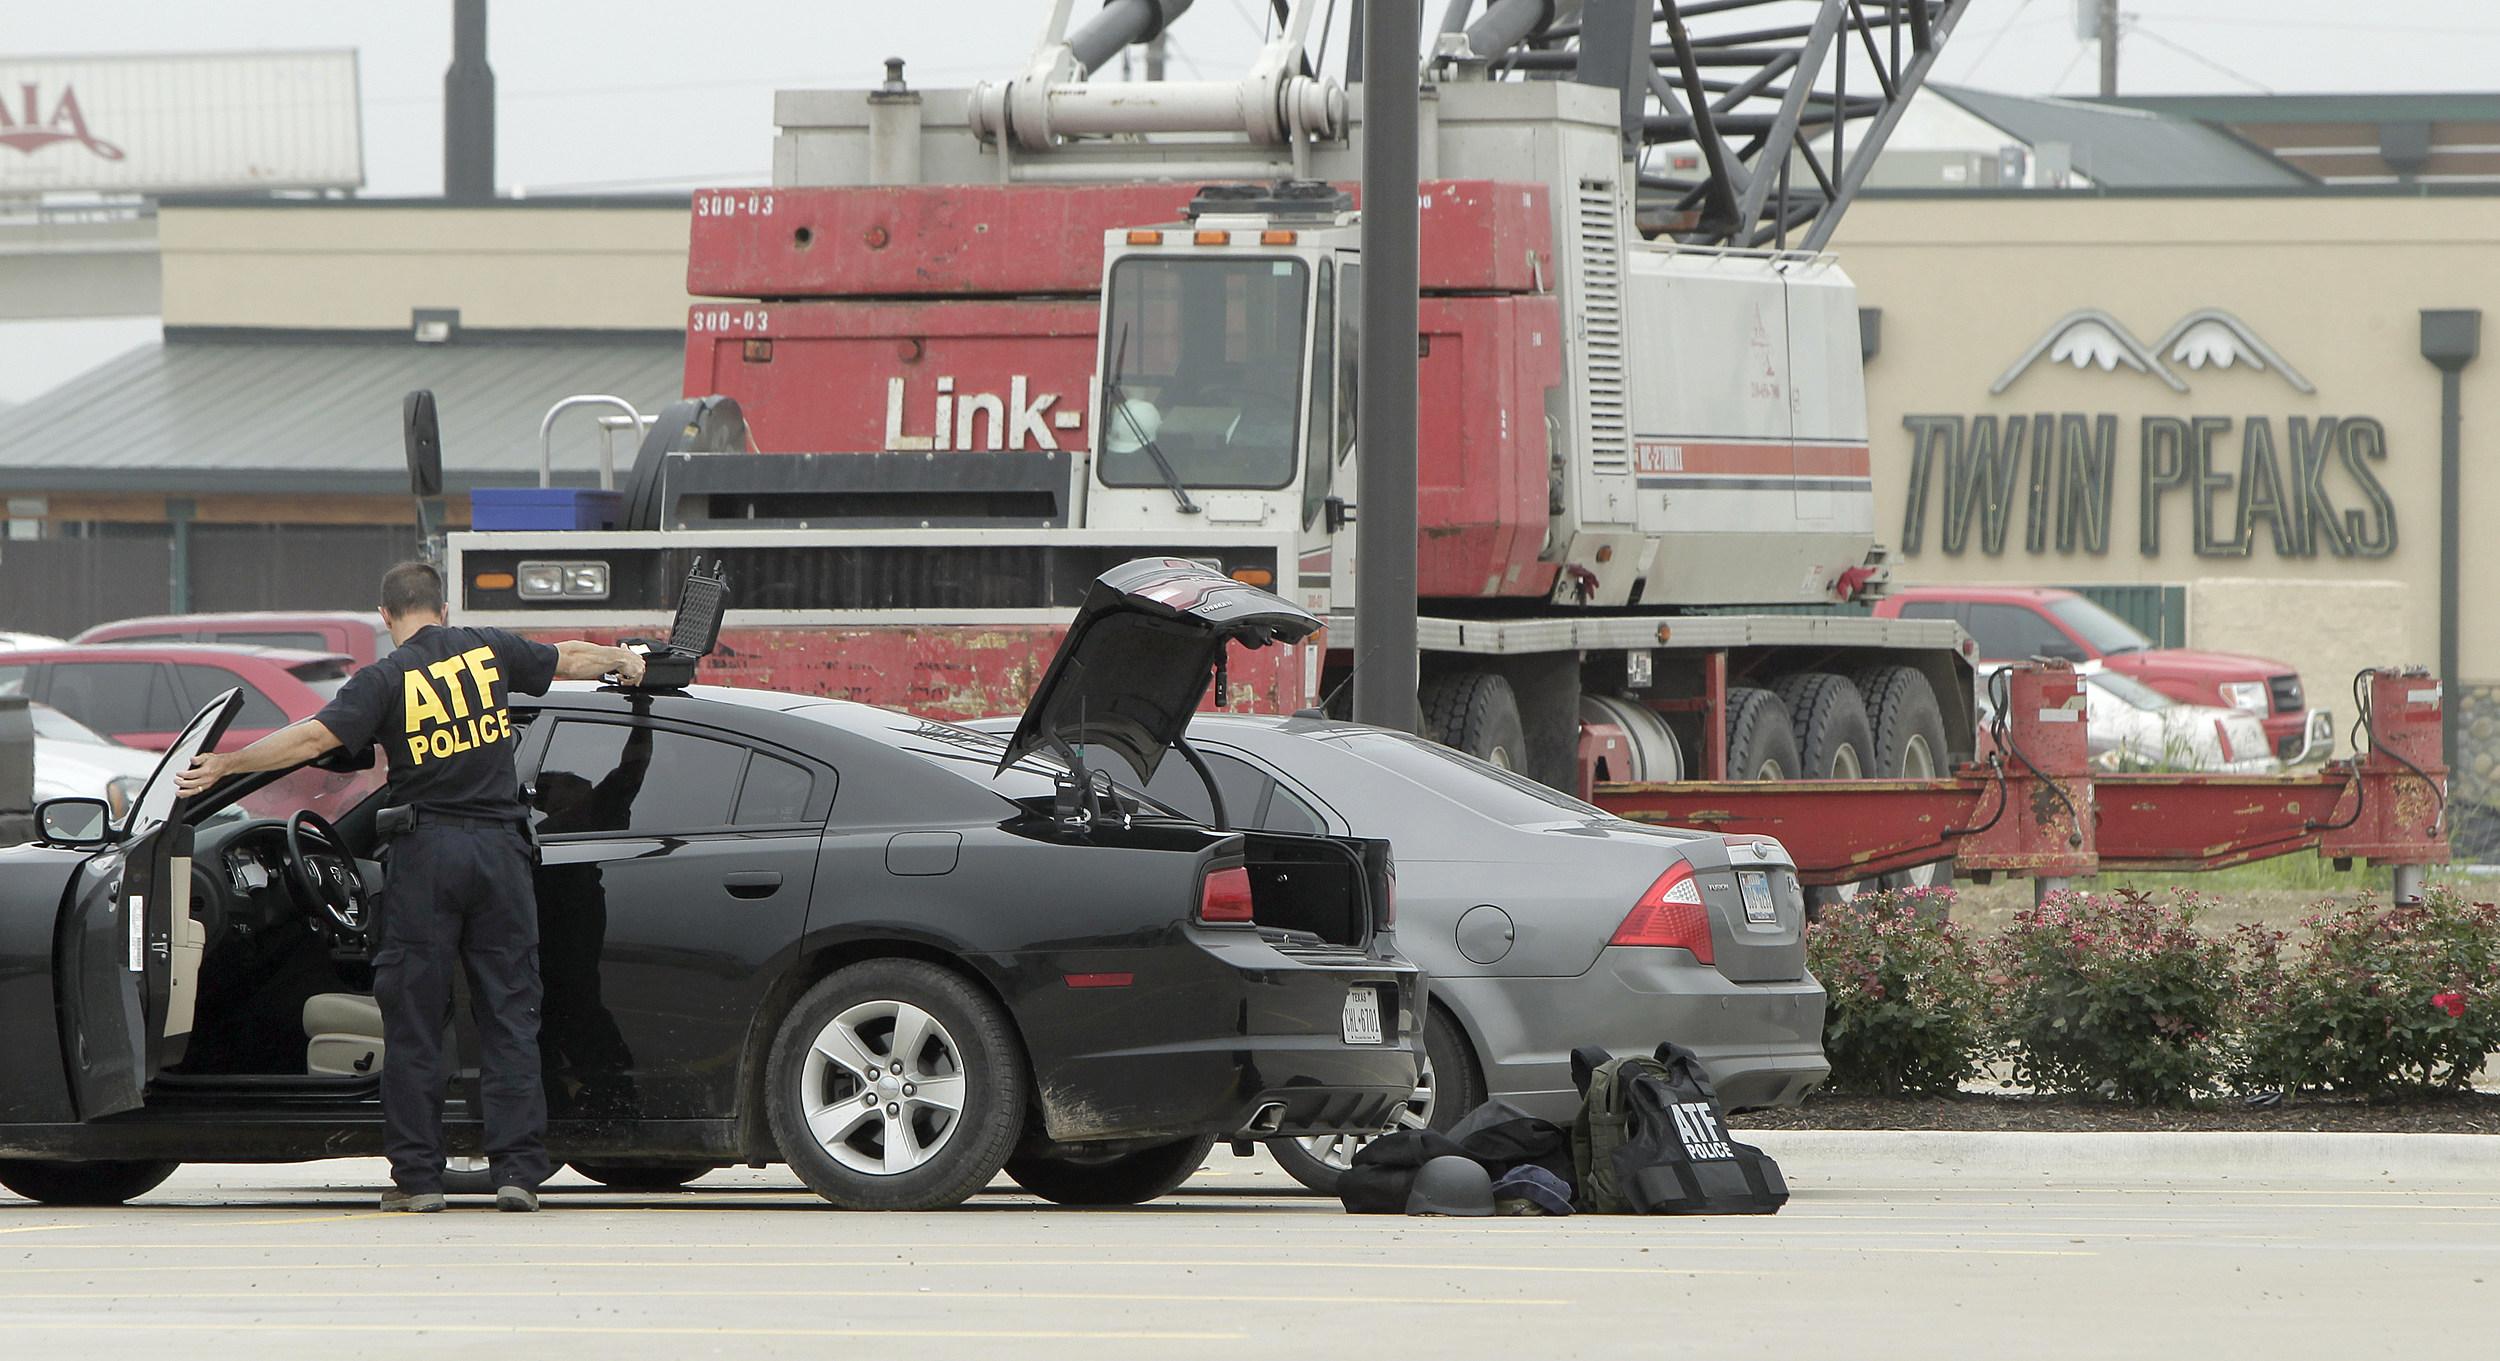 Nine Dead After Shootout Among Biker Gangs In Texas